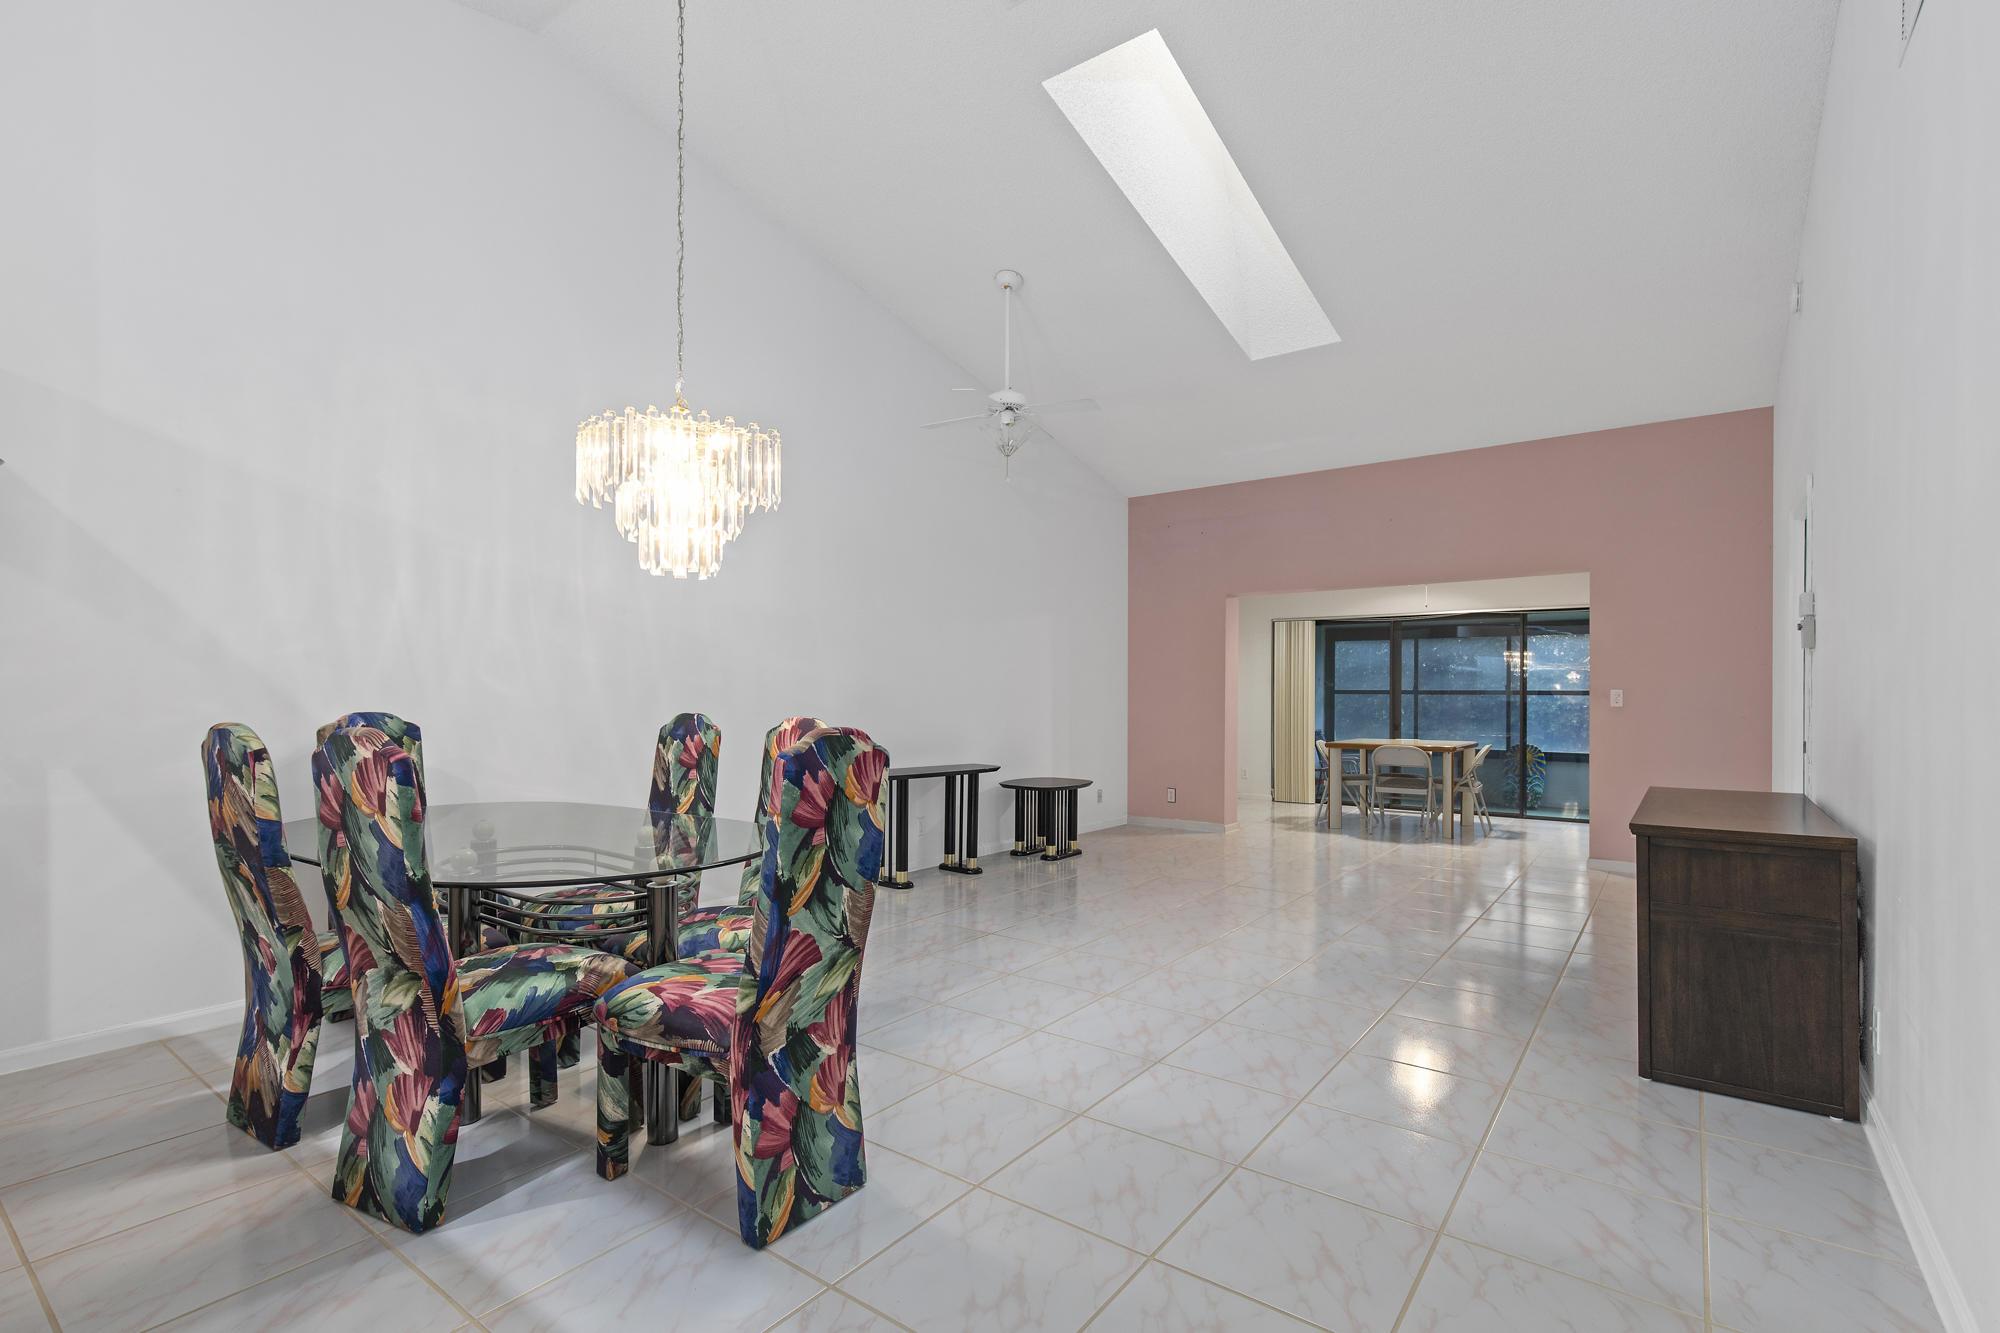 9747 Pavarotti Terrace 102 Boynton Beach, FL 33437 photo 6